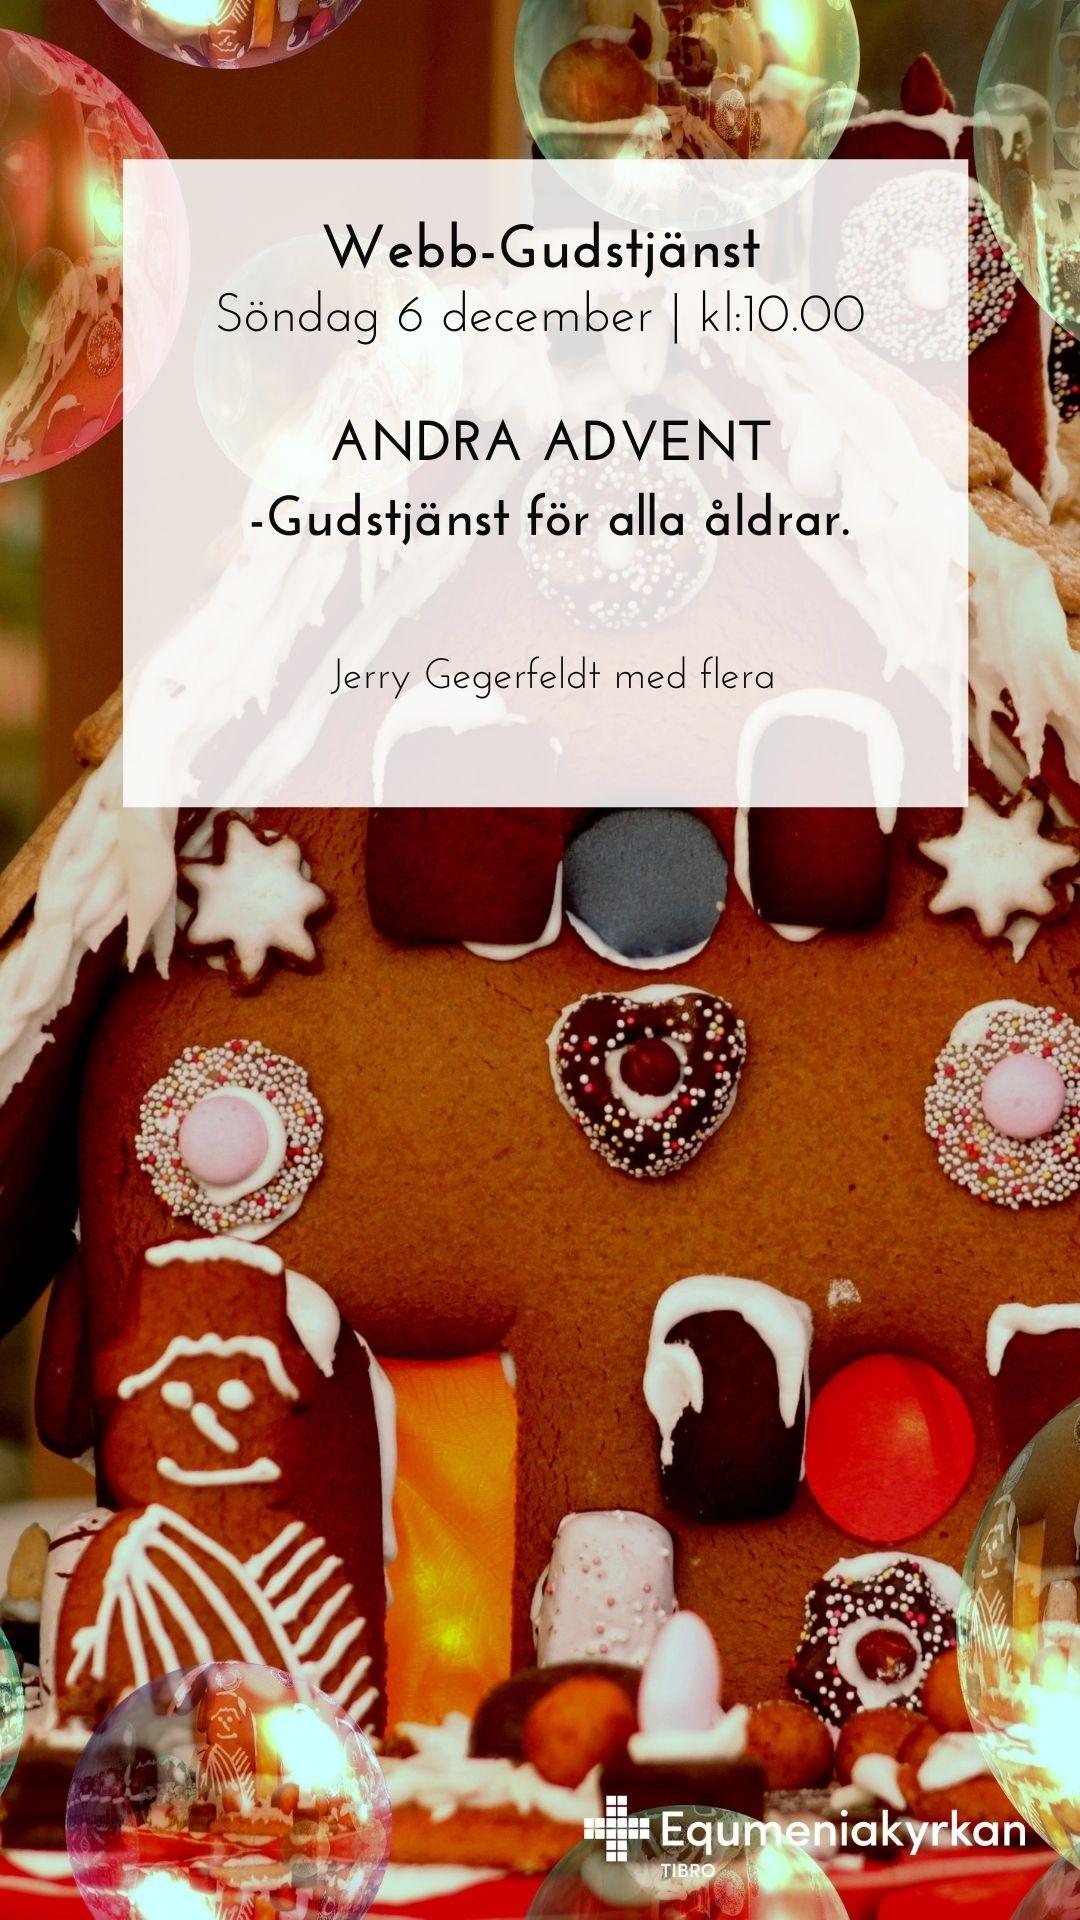 201206 tv andra advent